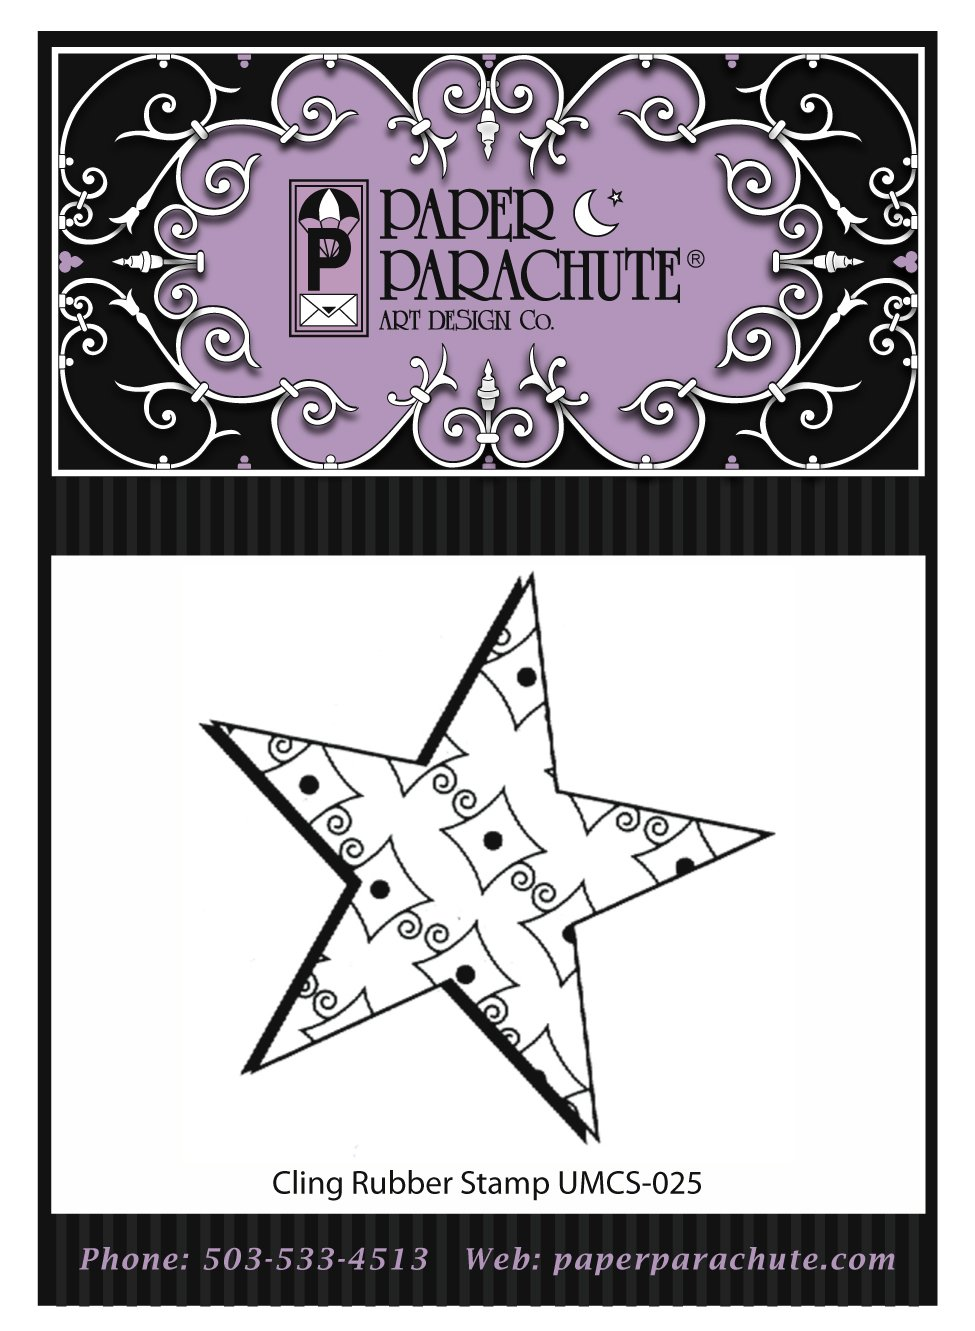 Paper Parachute Rubber Stamp - UMCS25